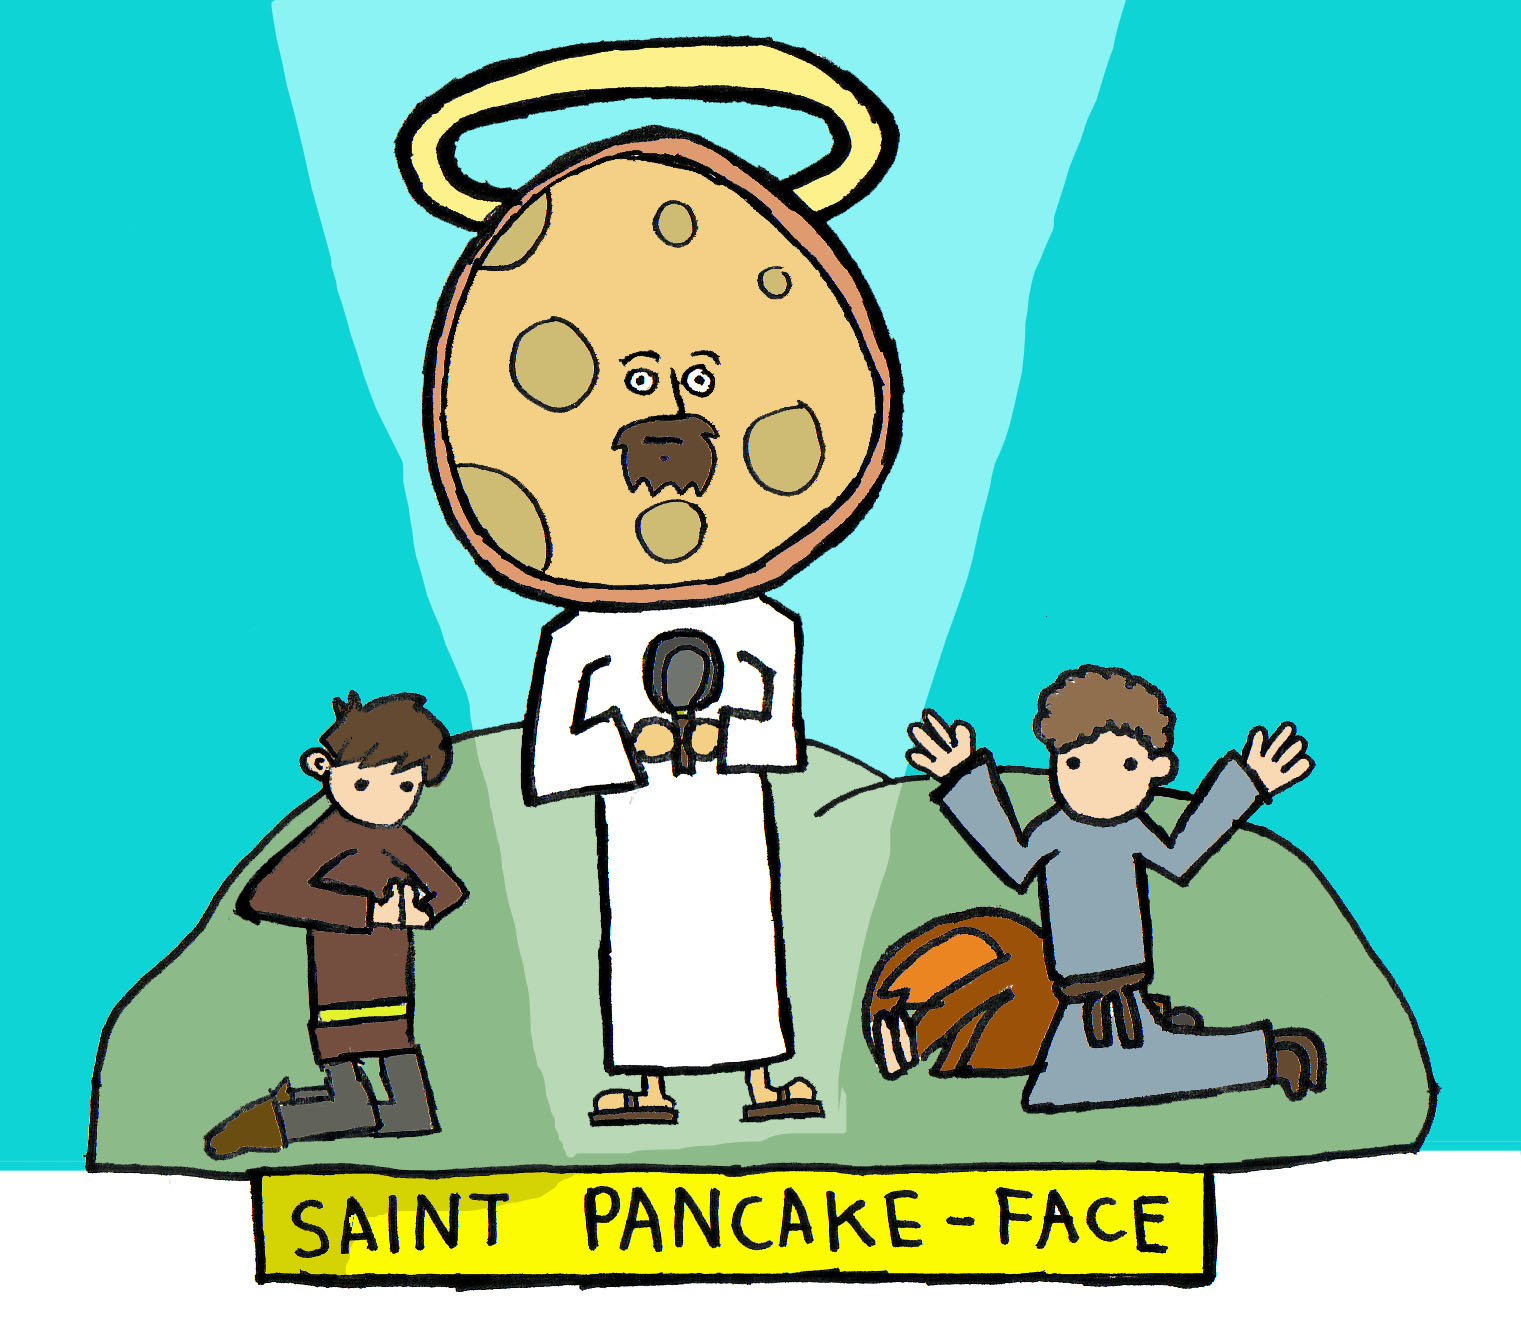 Saint Pancake-Face